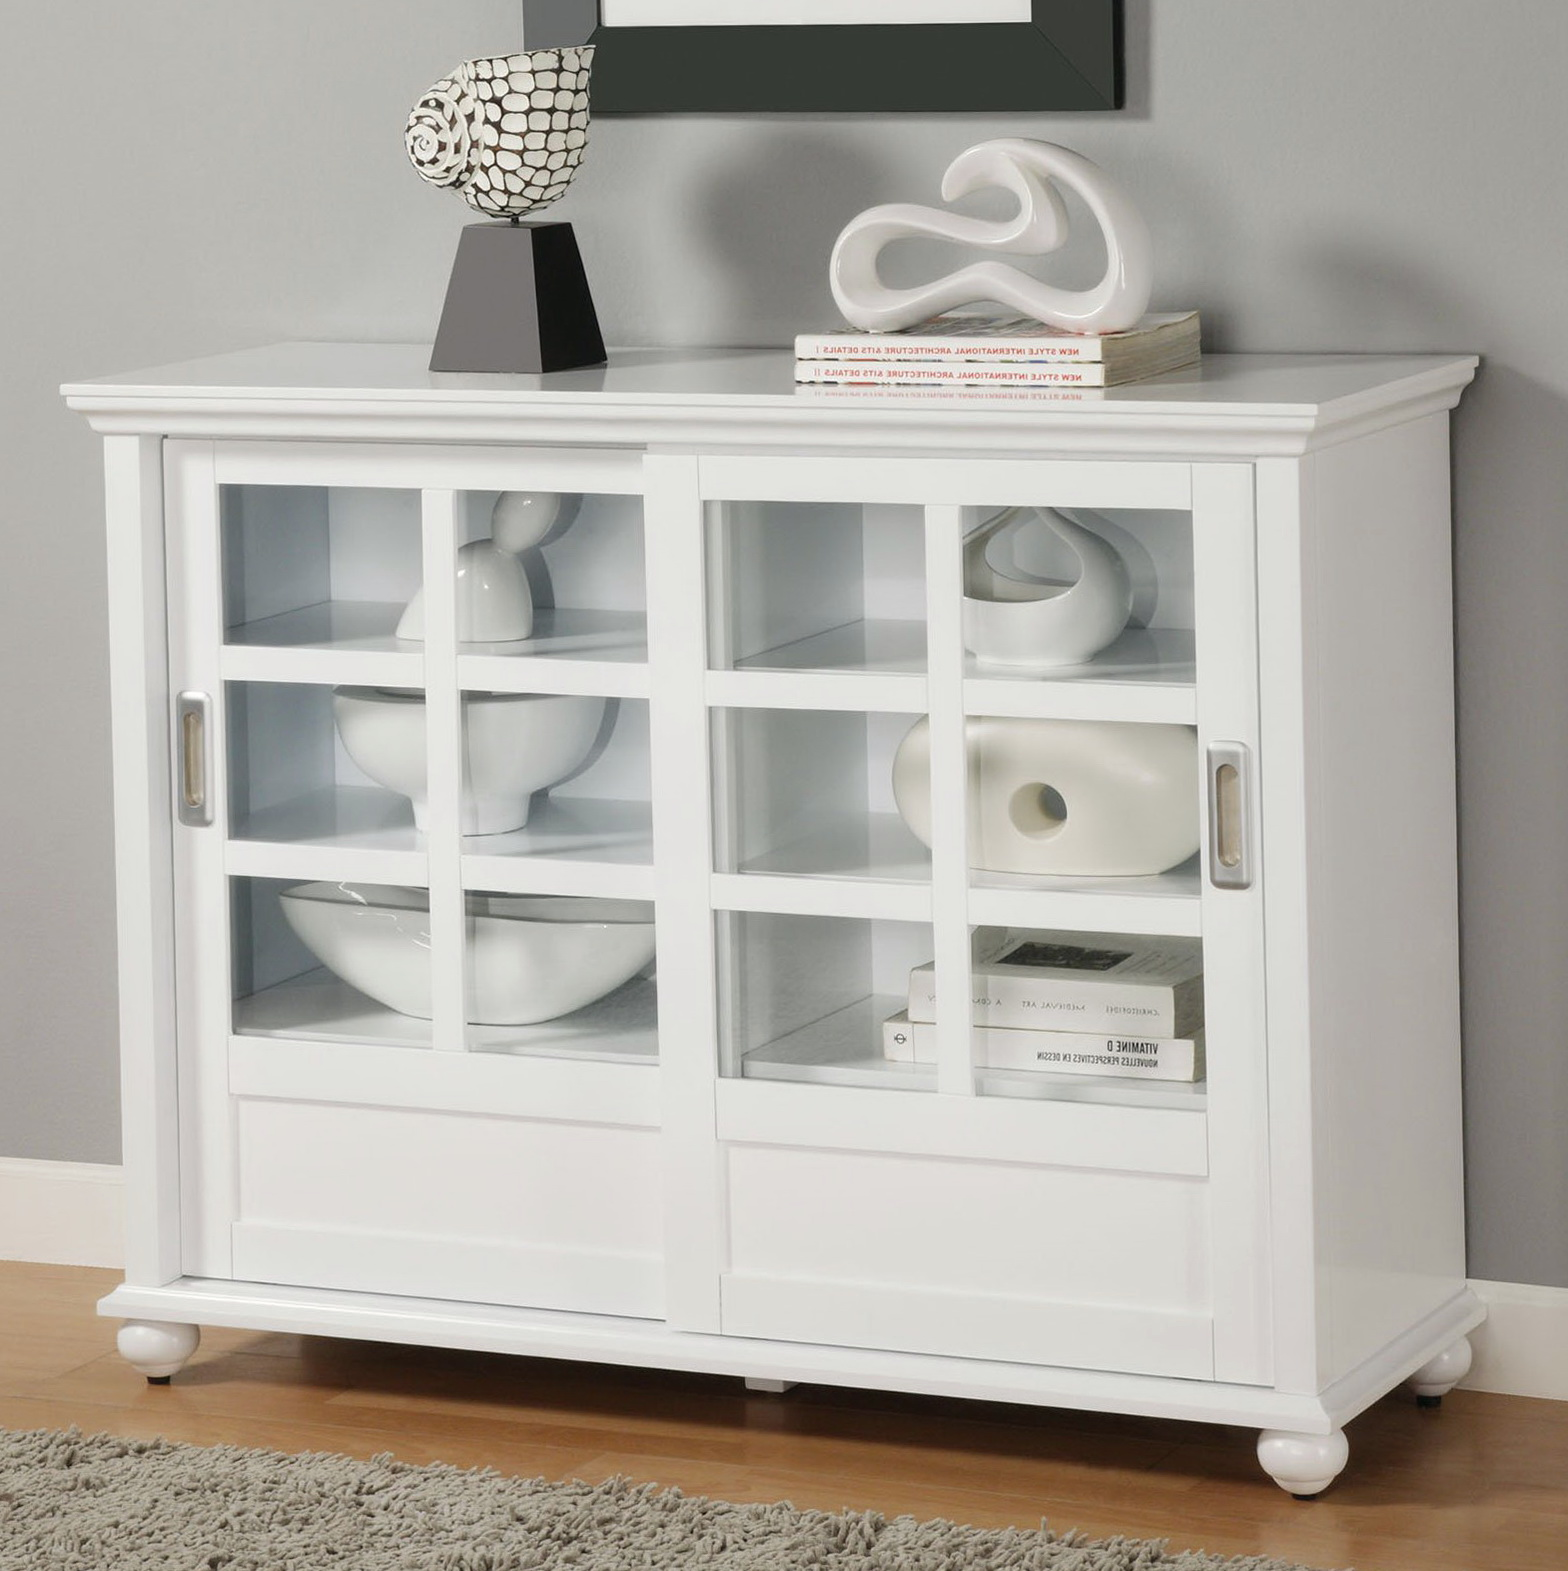 White Bookshelves With Glass Doors